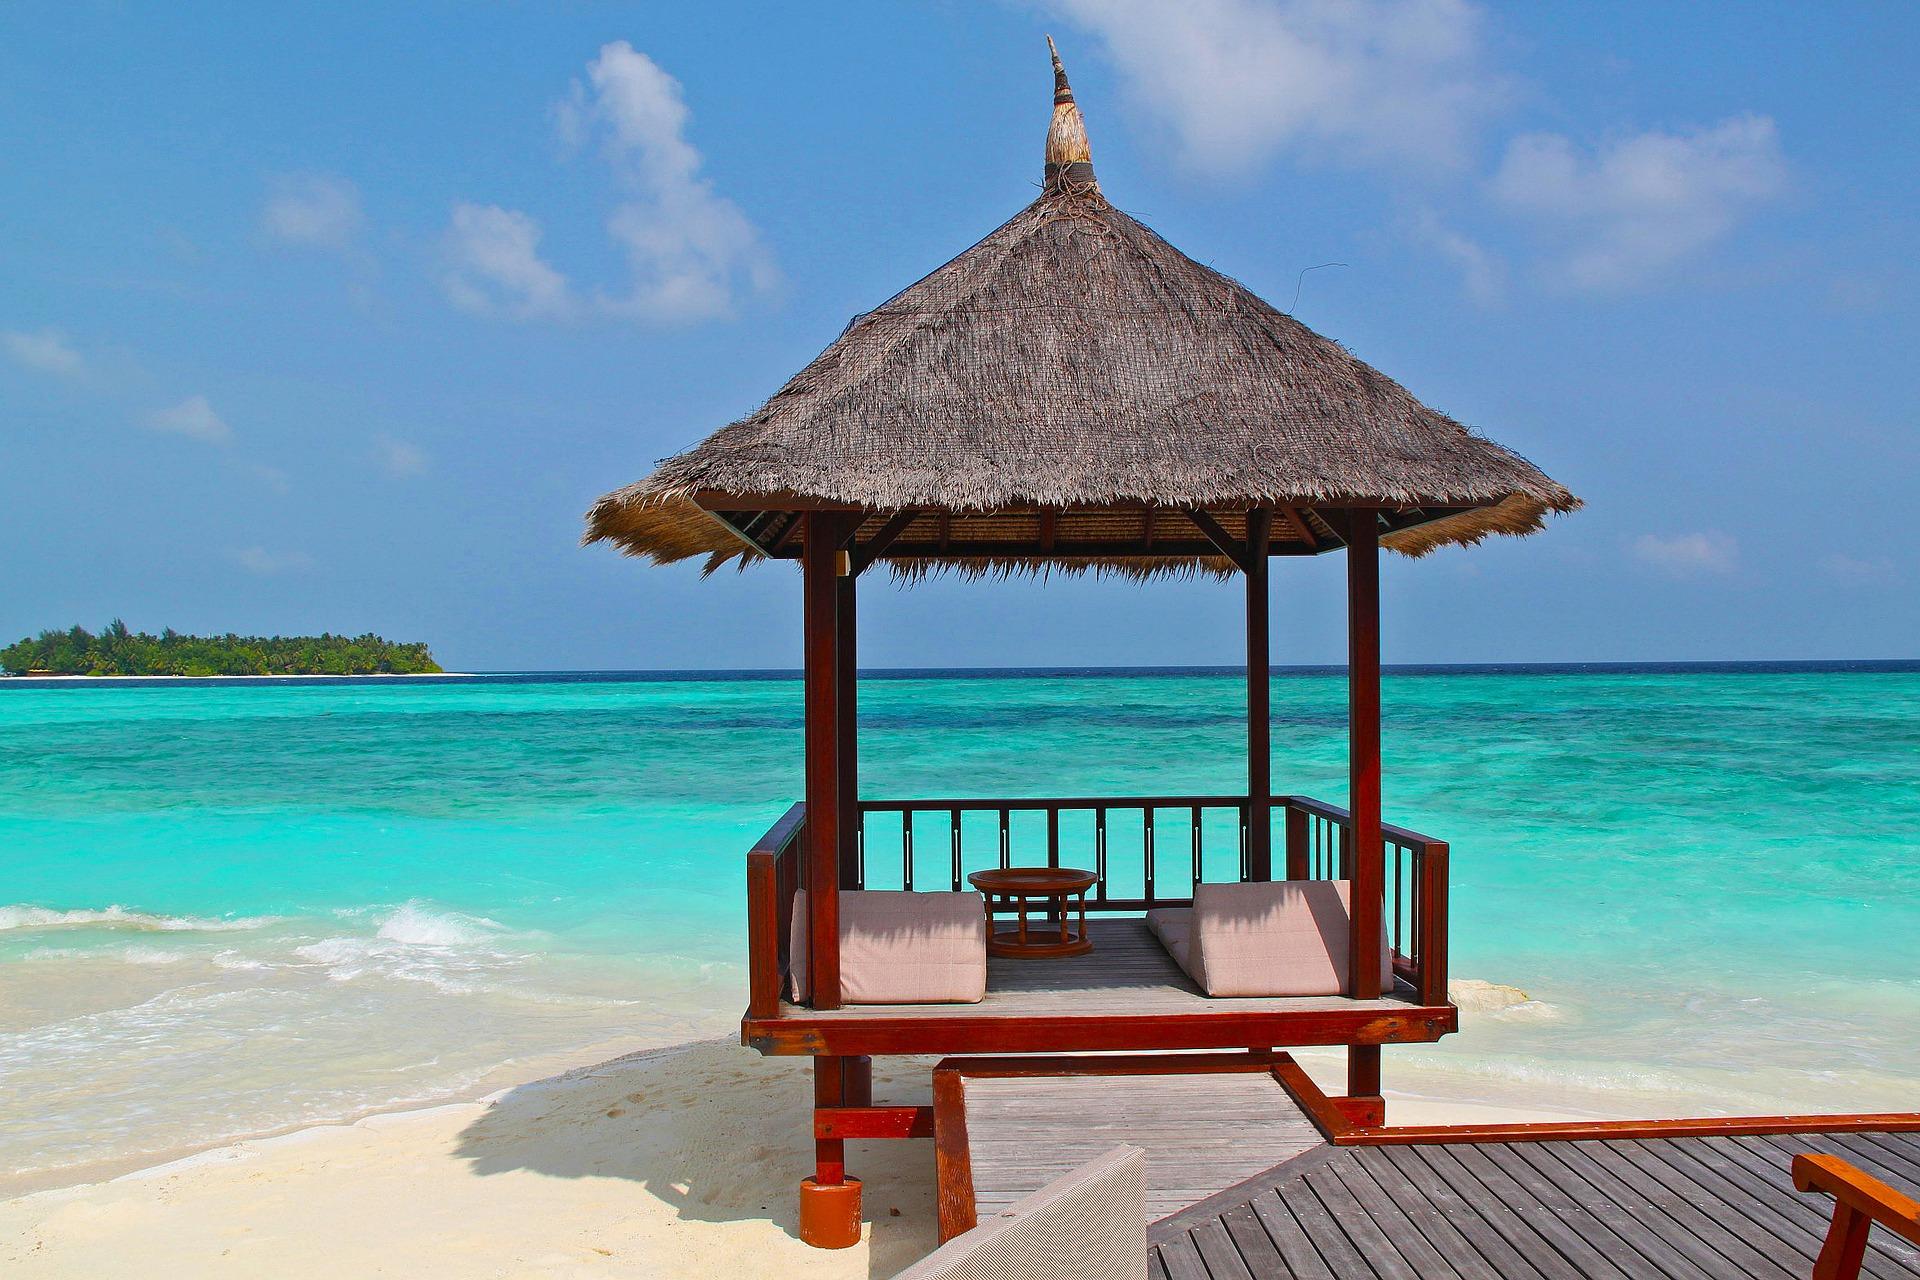 beach-hut-237489_1920